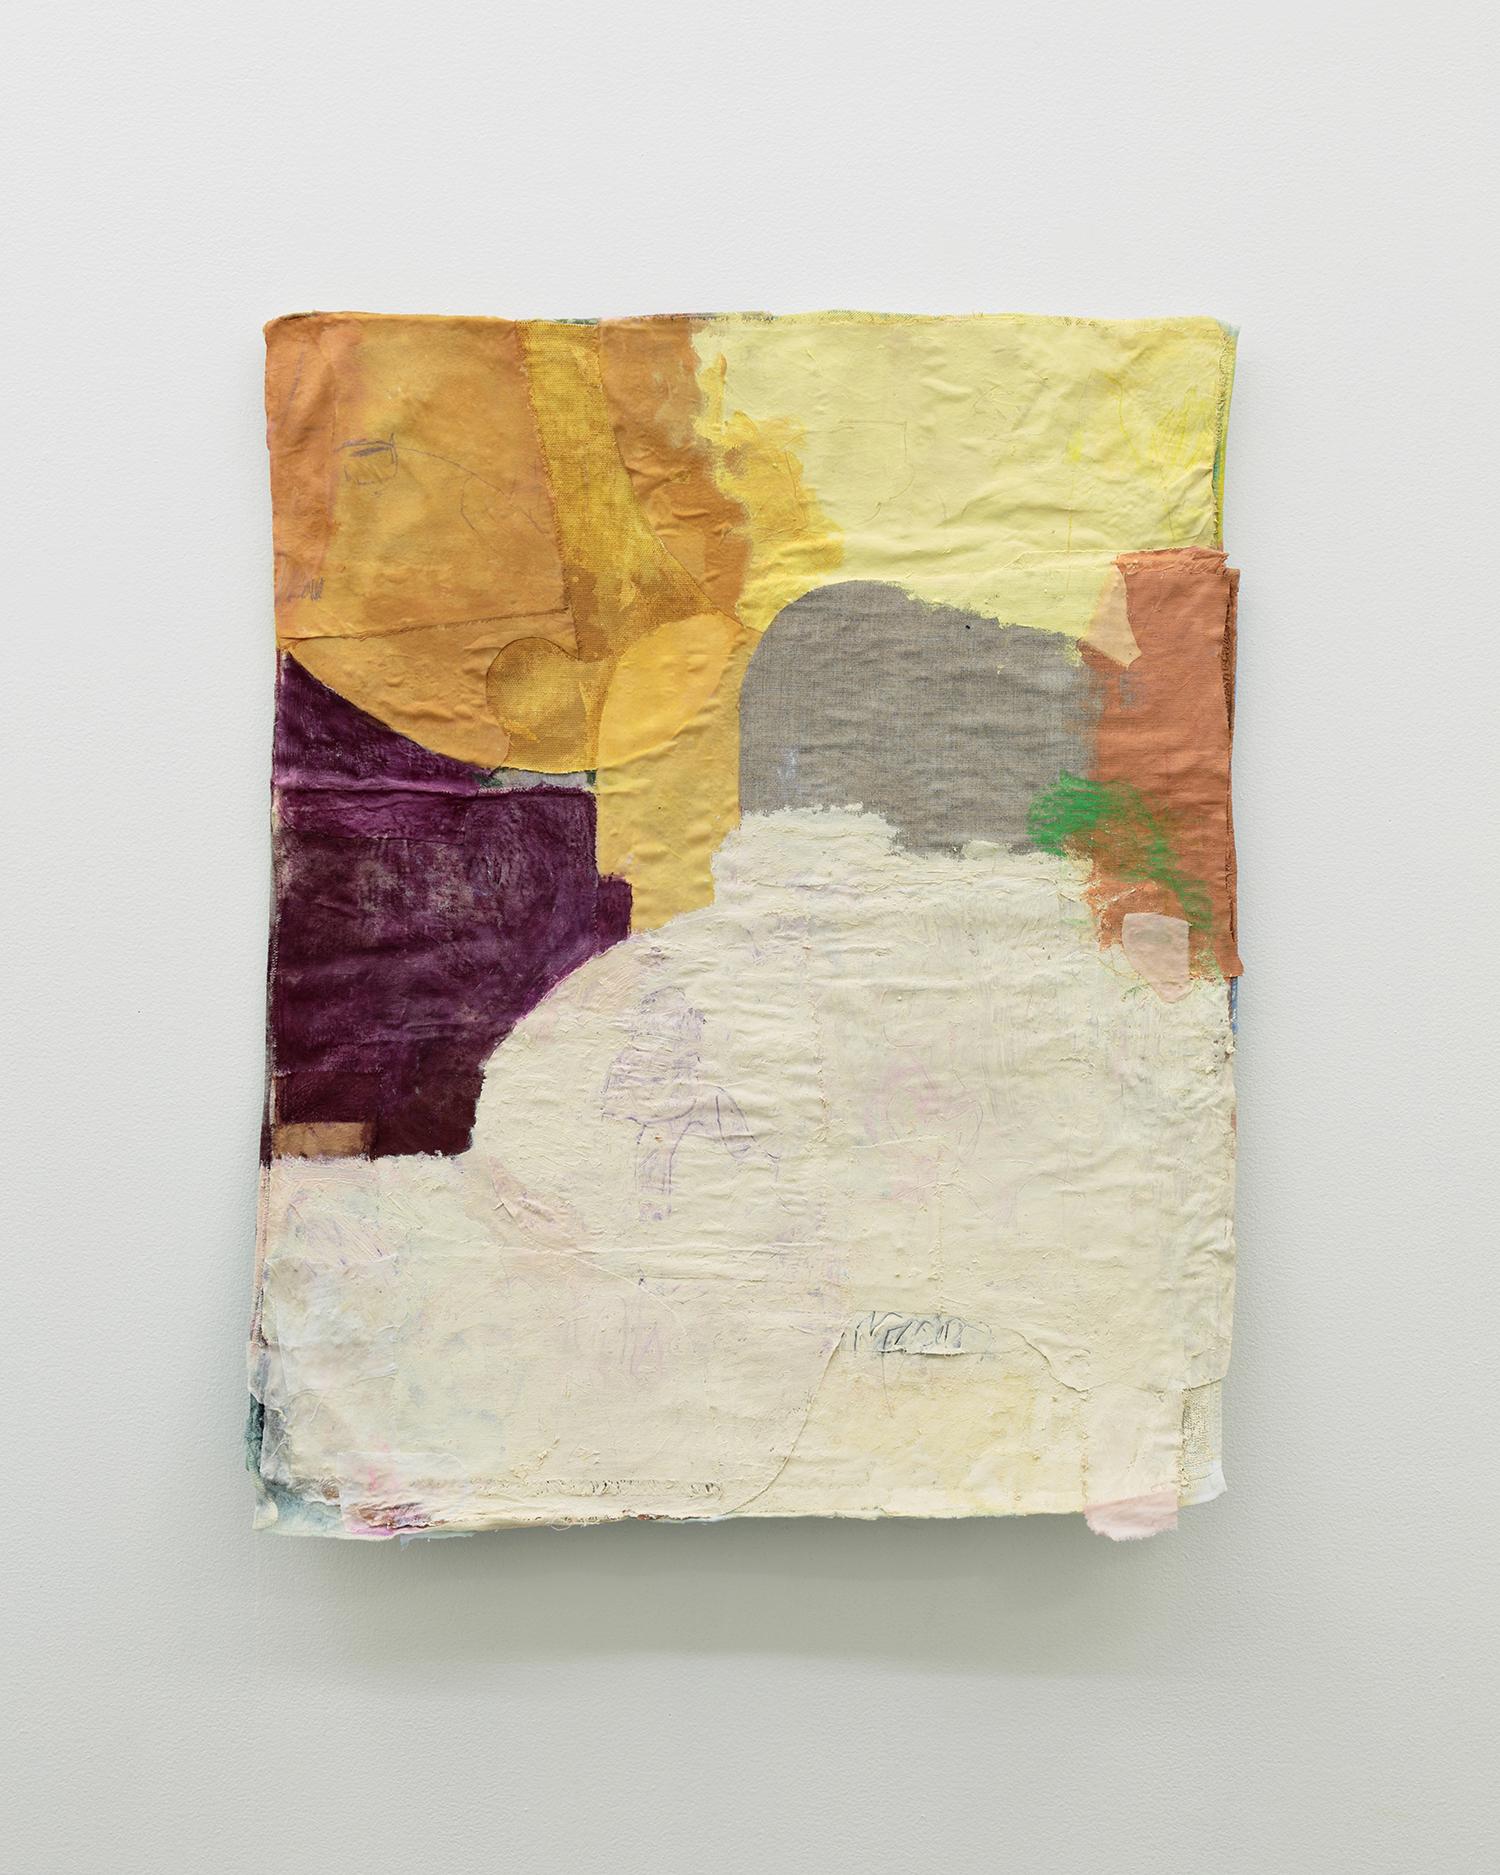 Jahnne Pasco-White